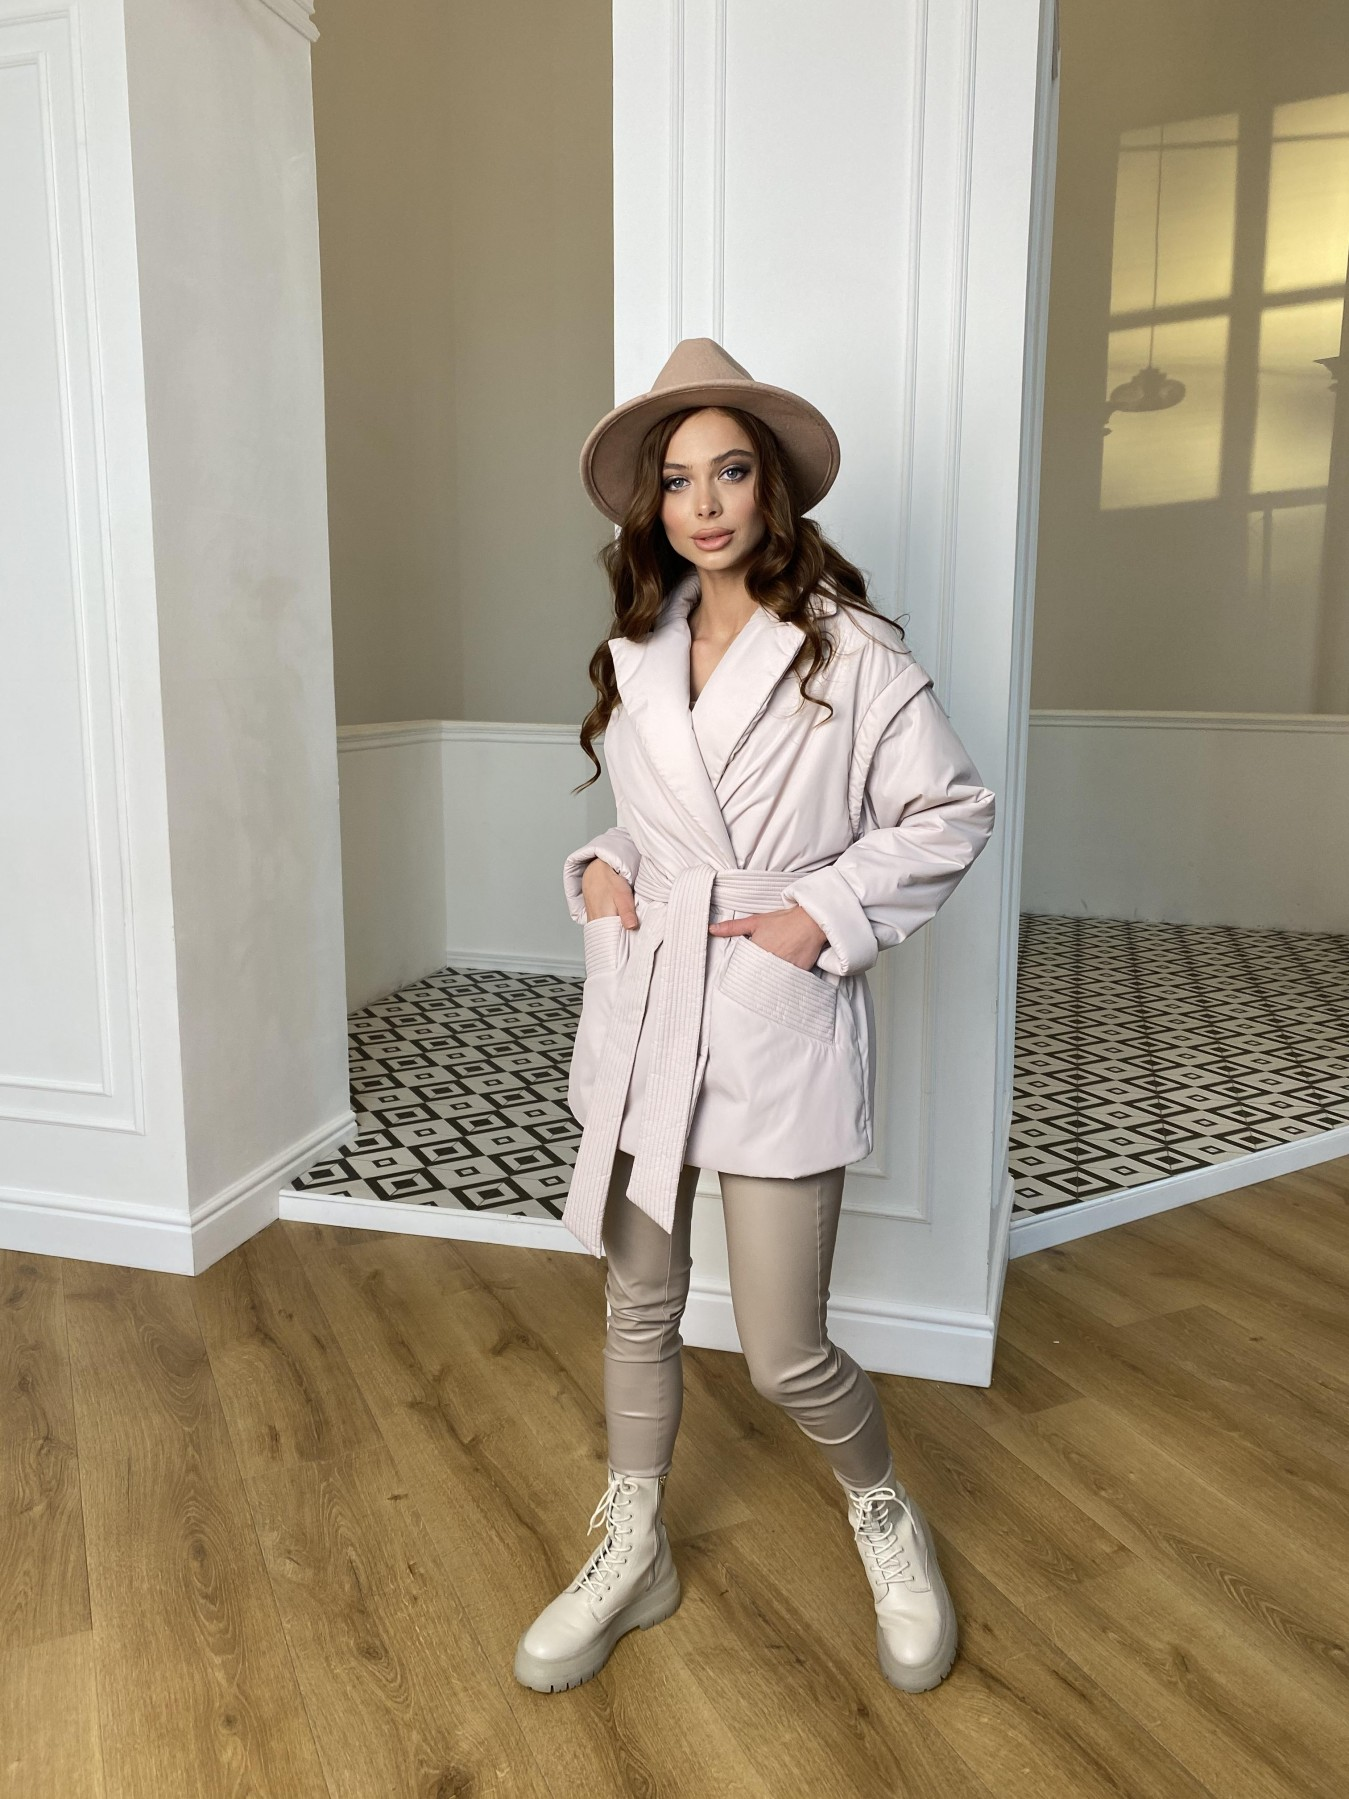 Форбс плащевка Ammy куртка 10817 АРТ. 47298 Цвет: Молоко - фото 2, интернет магазин tm-modus.ru